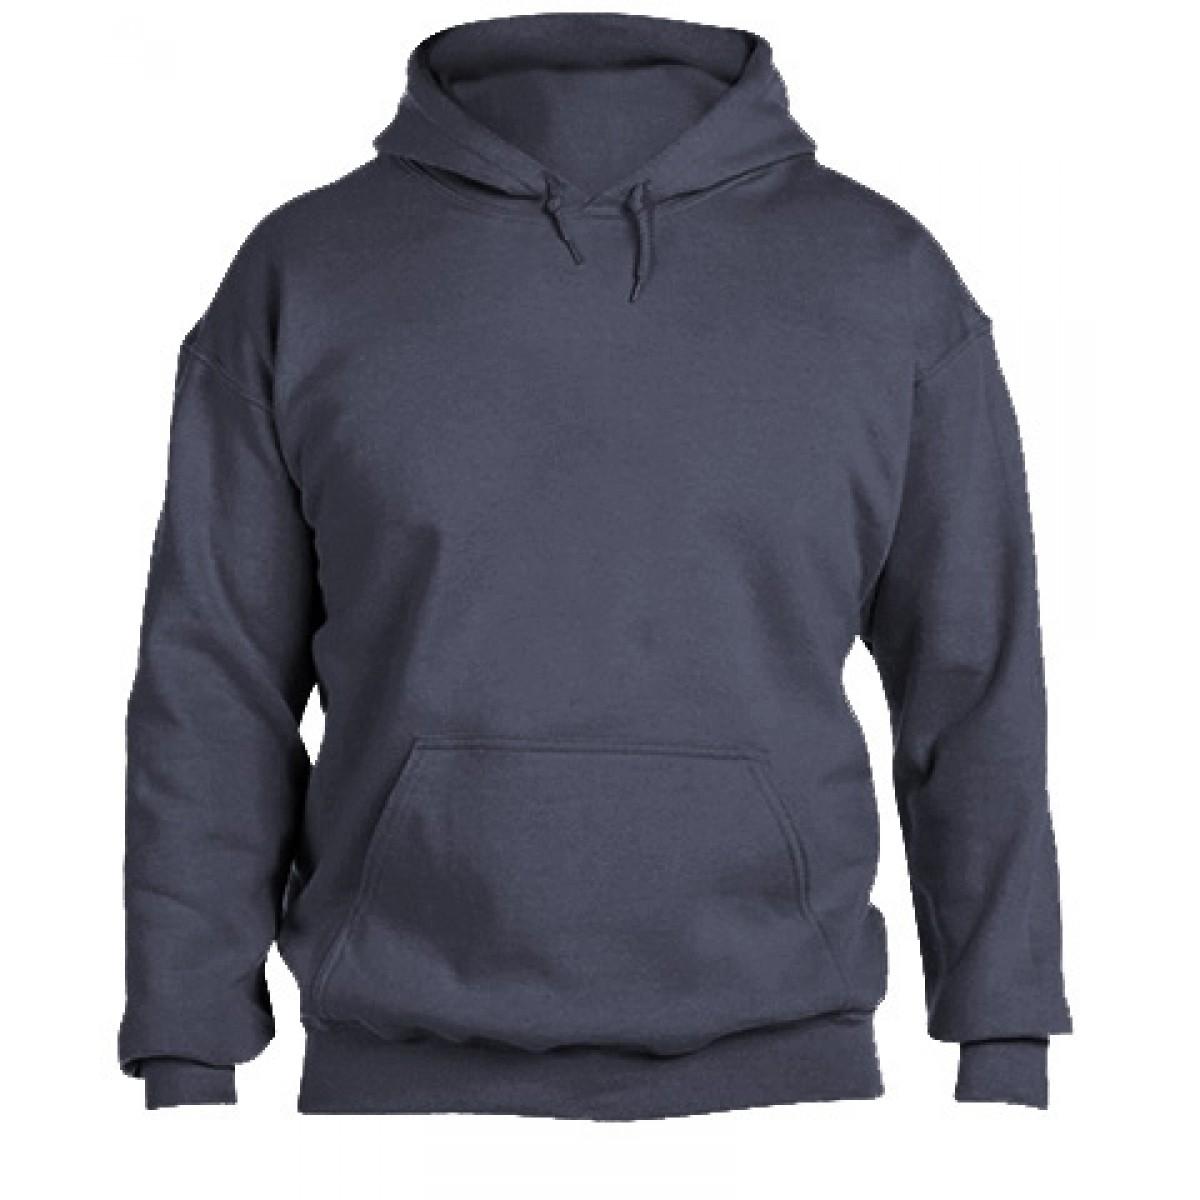 Solid Hooded Sweatshirt  50/50 Heavy Blend-Heather Navy-YM